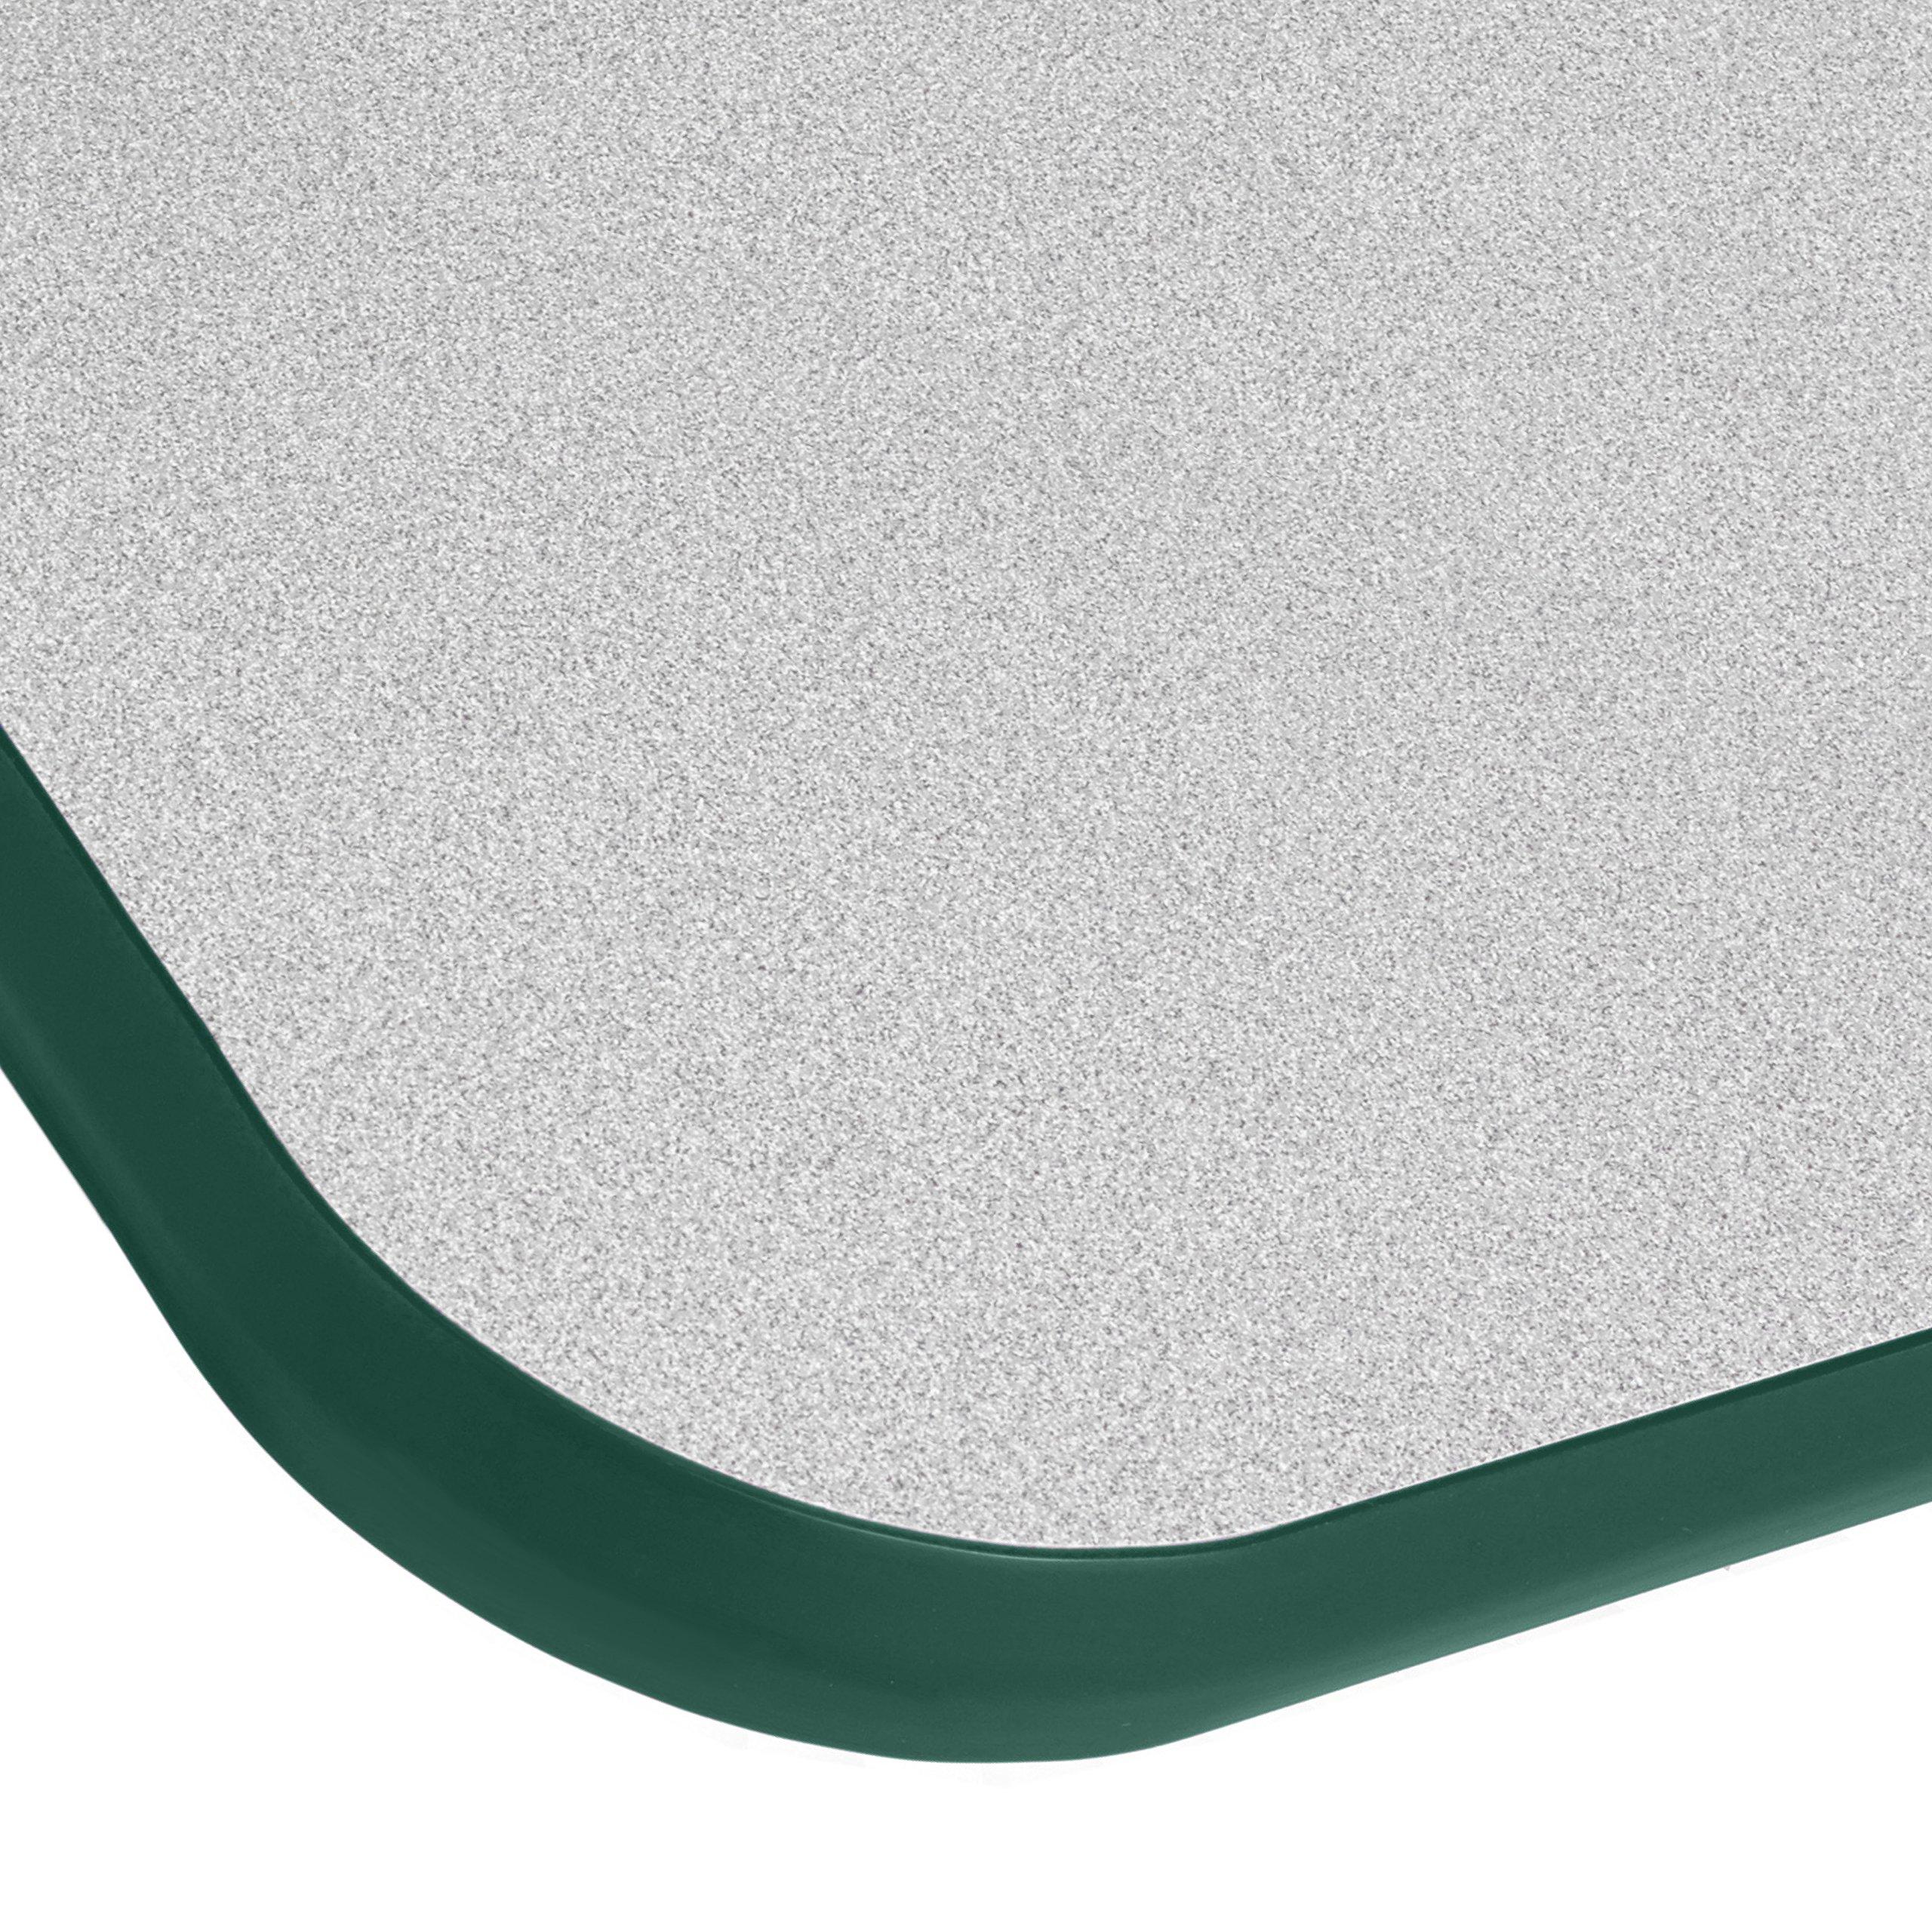 ECR4Kids Mesa T-Mold 30'' x 48'' Rectangular School Activity Table, Toddler Legs w/ Swivel Glides, Adjustable Height 15-23 inch (Grey/Green) by ECR4Kids (Image #1)